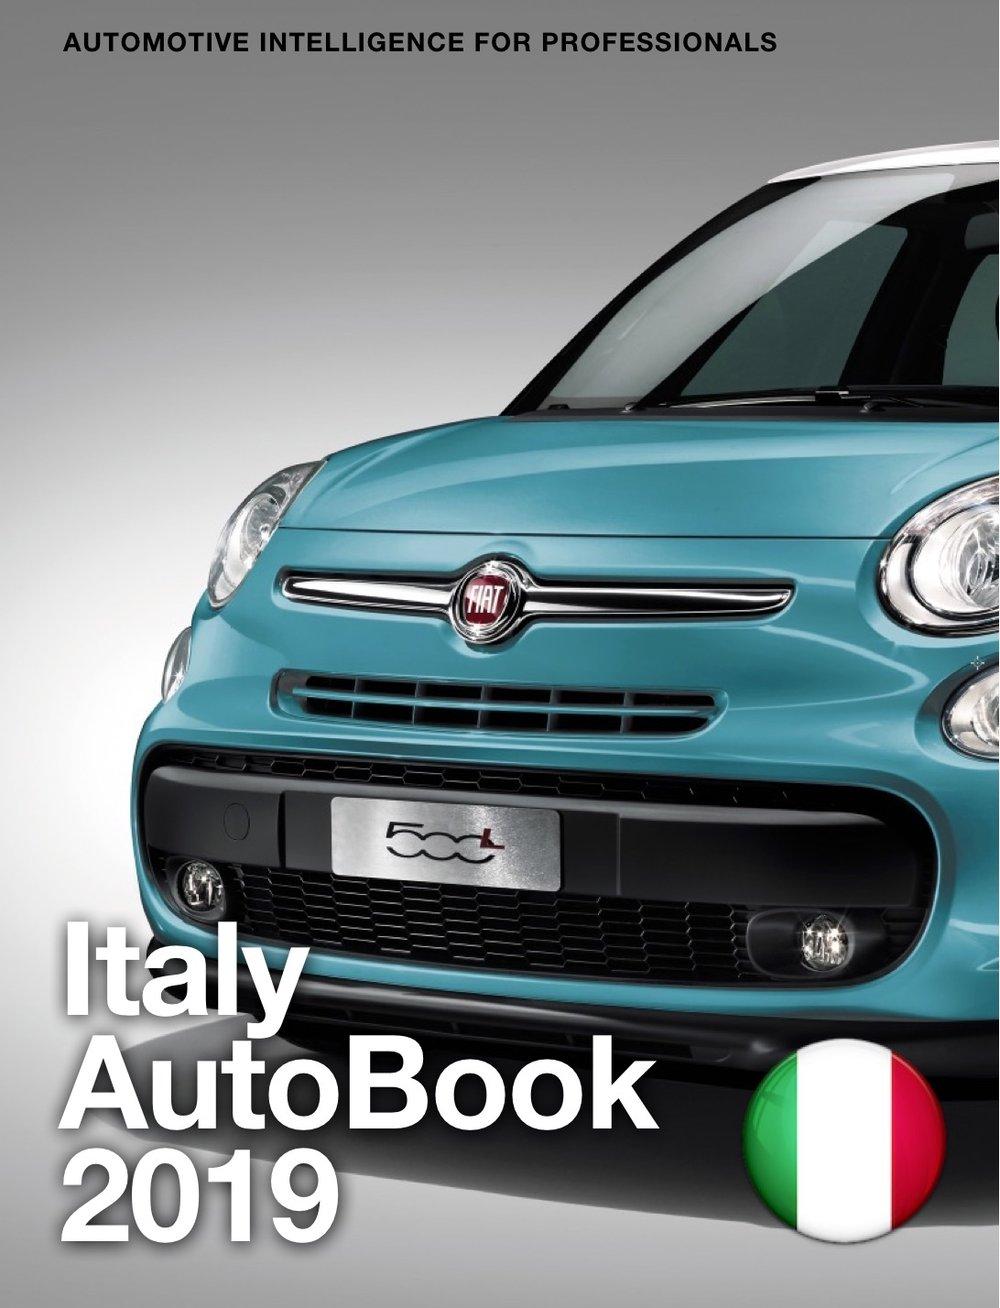 Italy AutoBook 2019 Cover.jpg